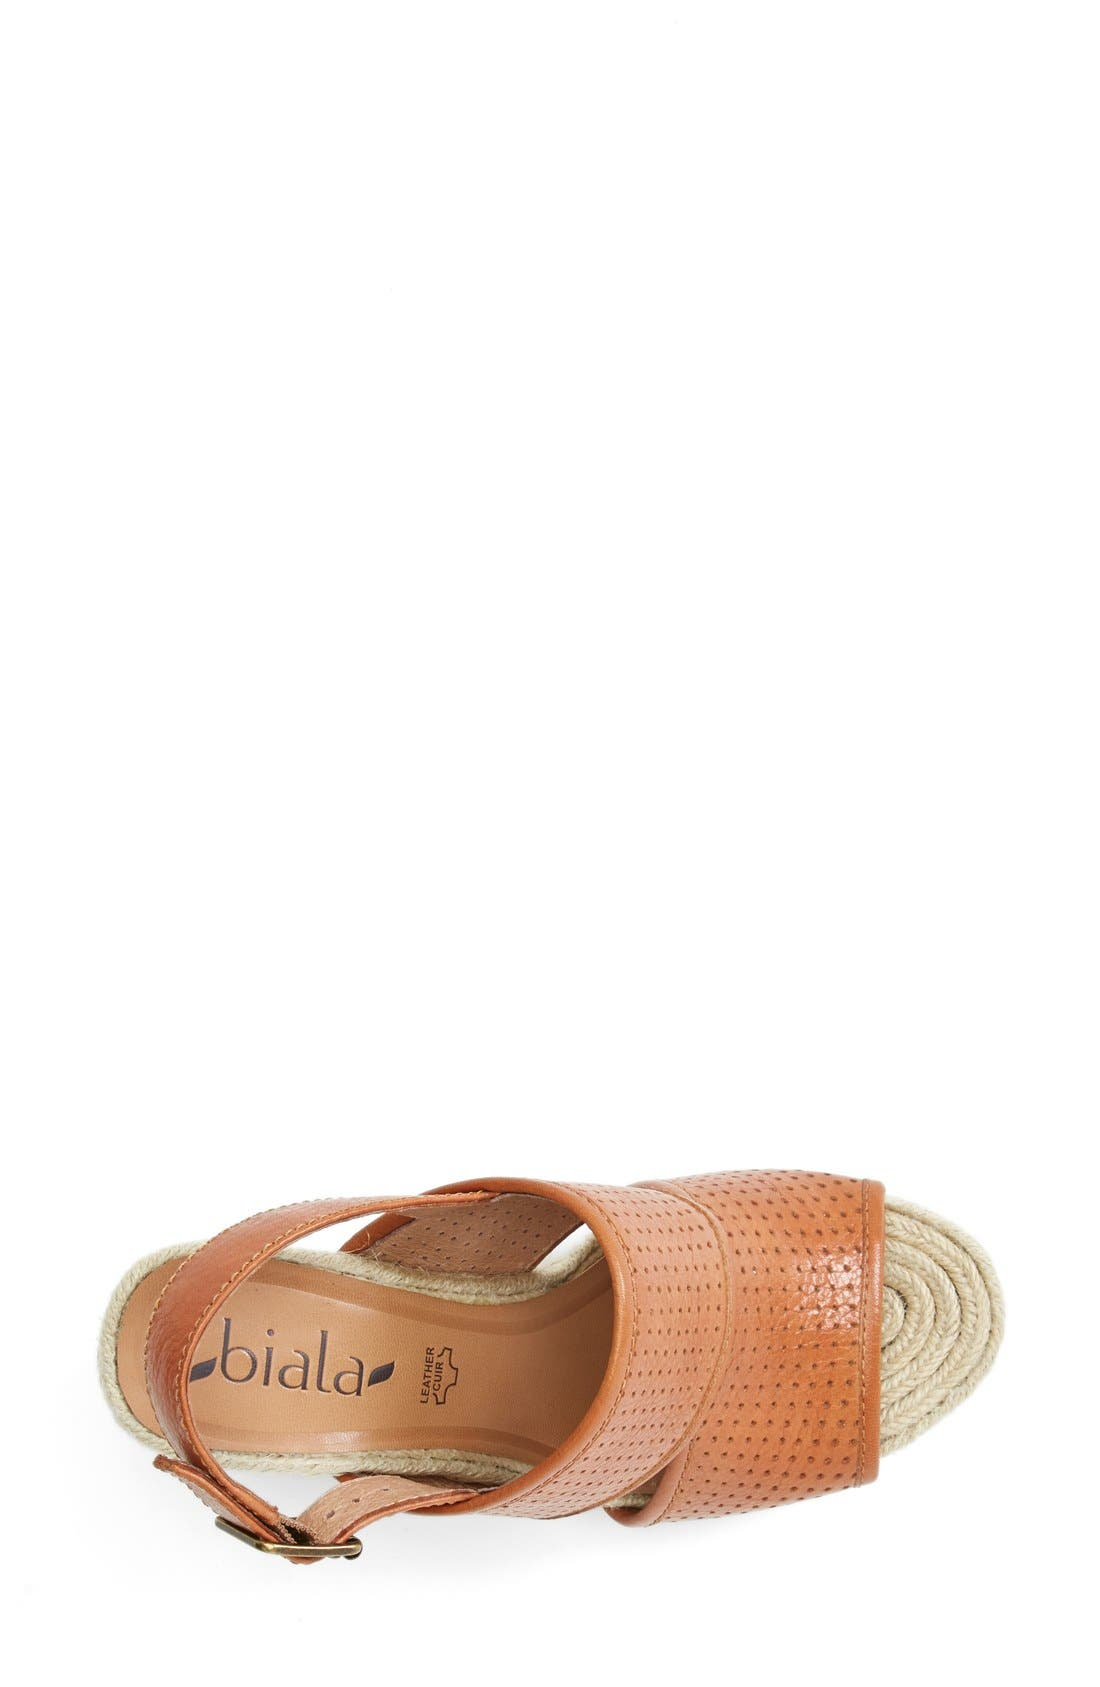 'Joyce' Perforated Espadrille Wedge Sandal,                             Alternate thumbnail 3, color,                             Brown